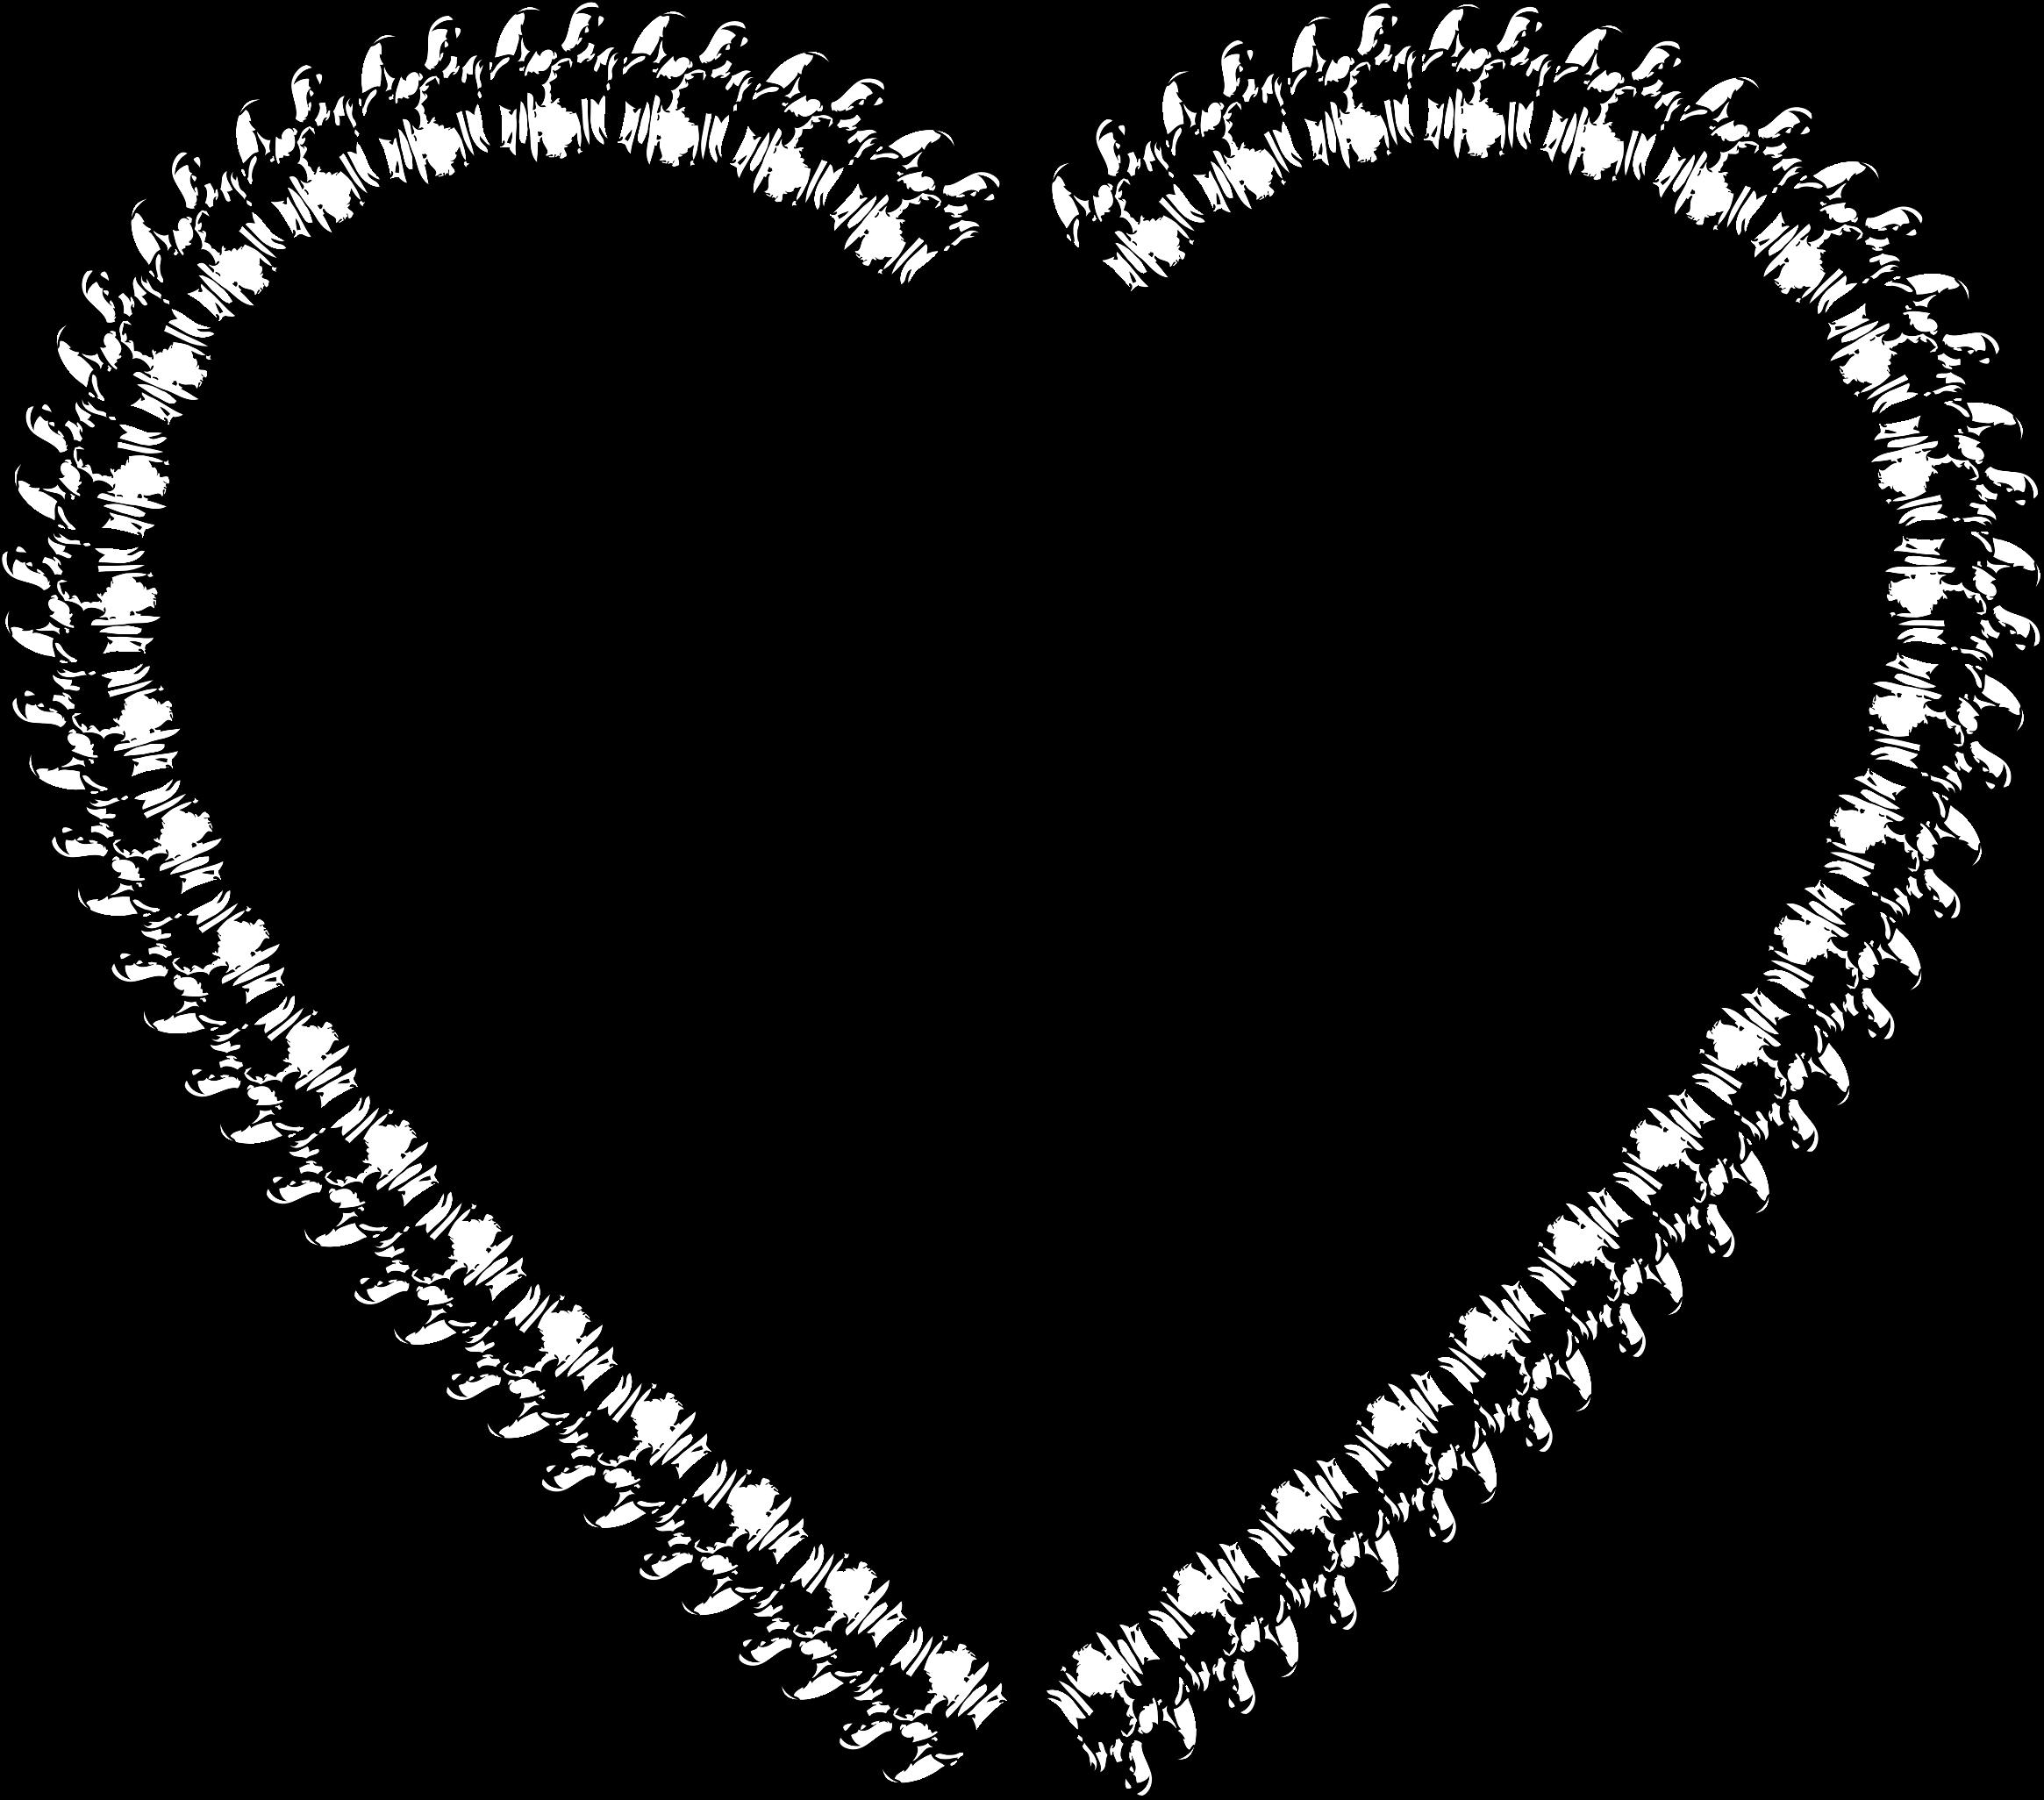 Clipart science heart. Vertebrae big image png